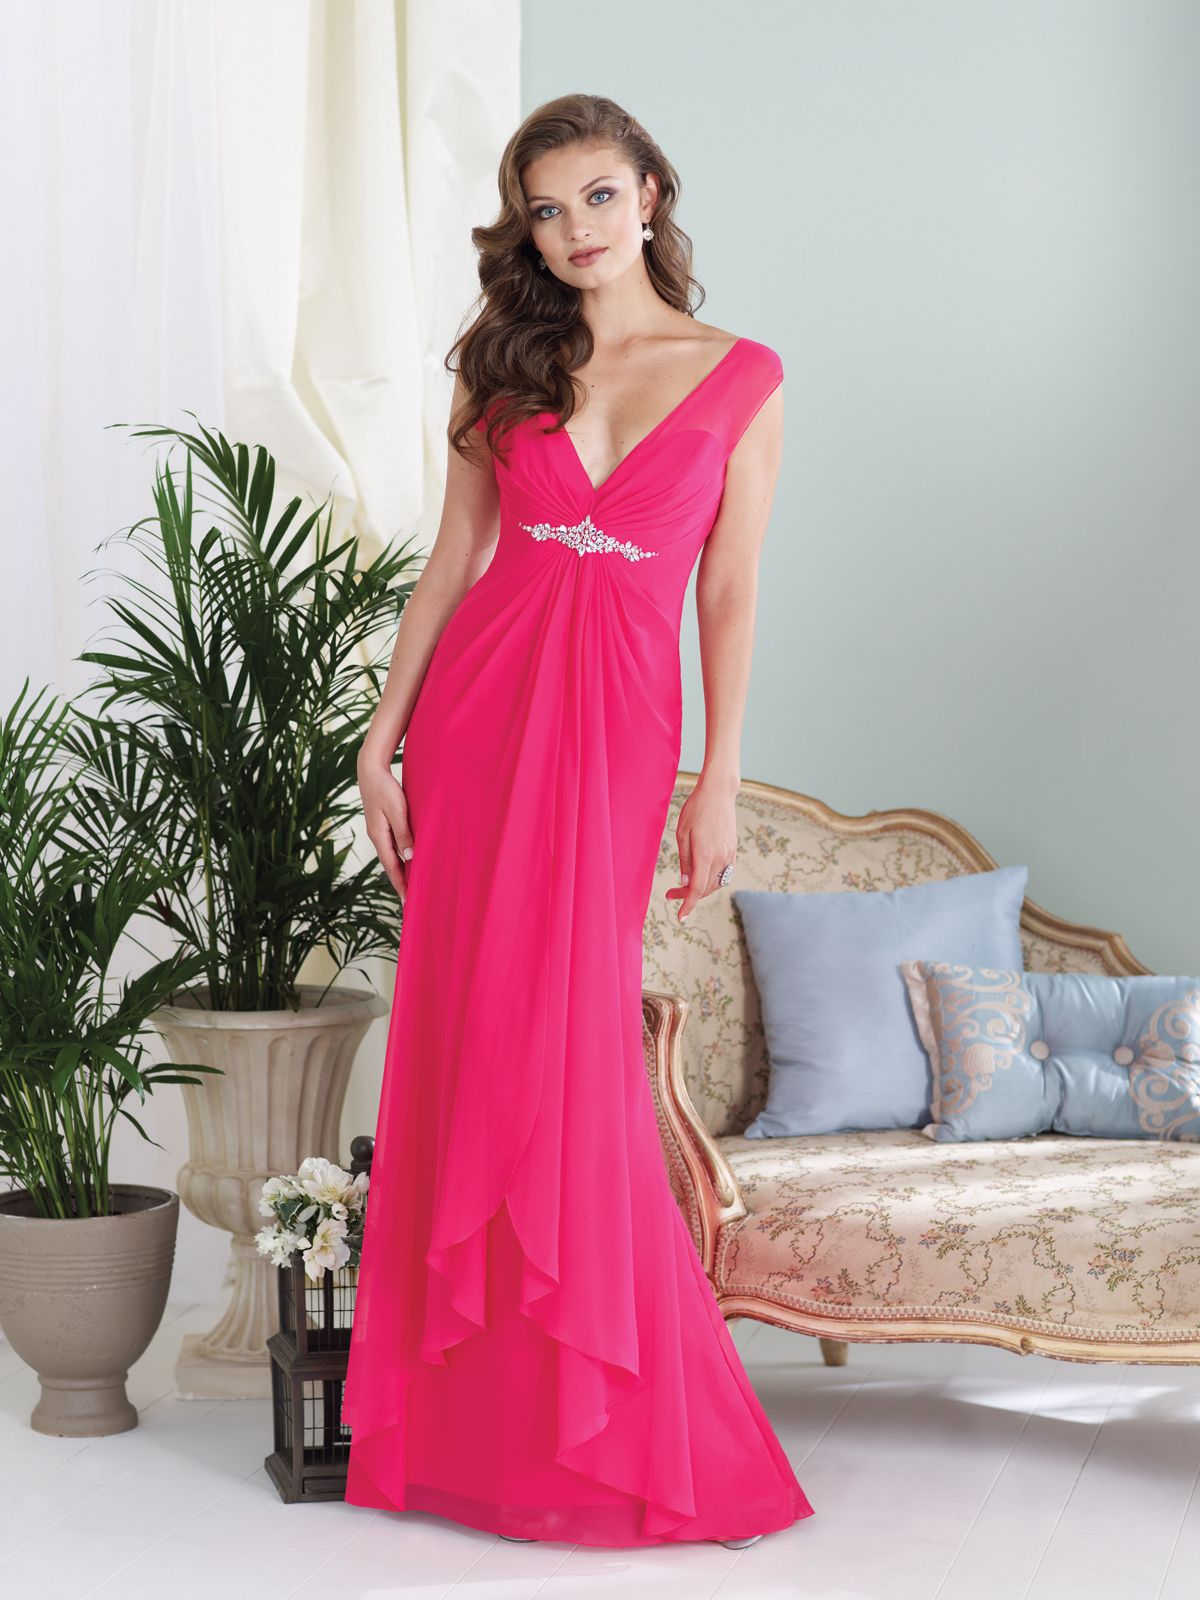 Sheath Off Shoulder V Neck Floor Length Fuchsia Chiffon Bridesmaid Dresses Sophia Tolli